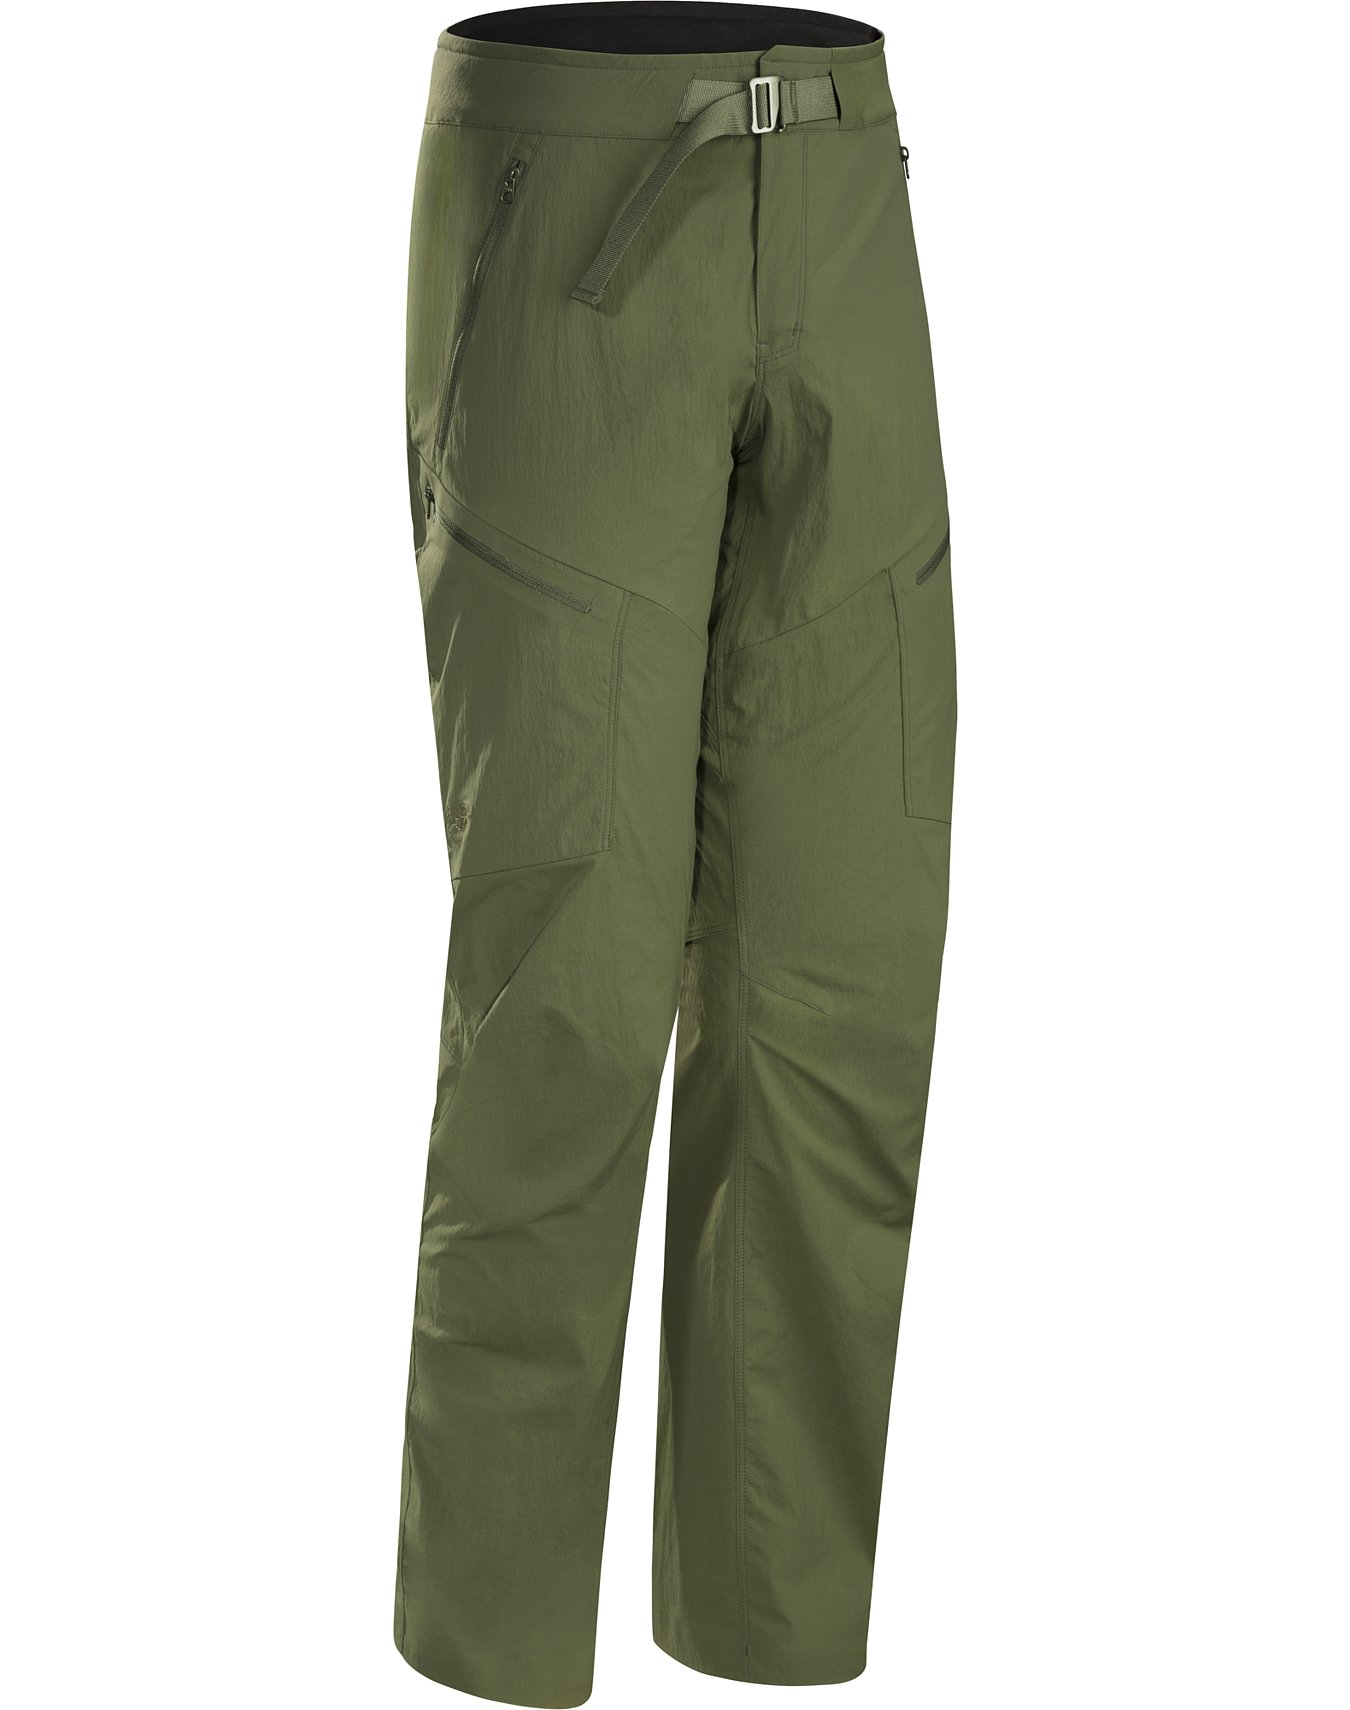 Hose aus nylon